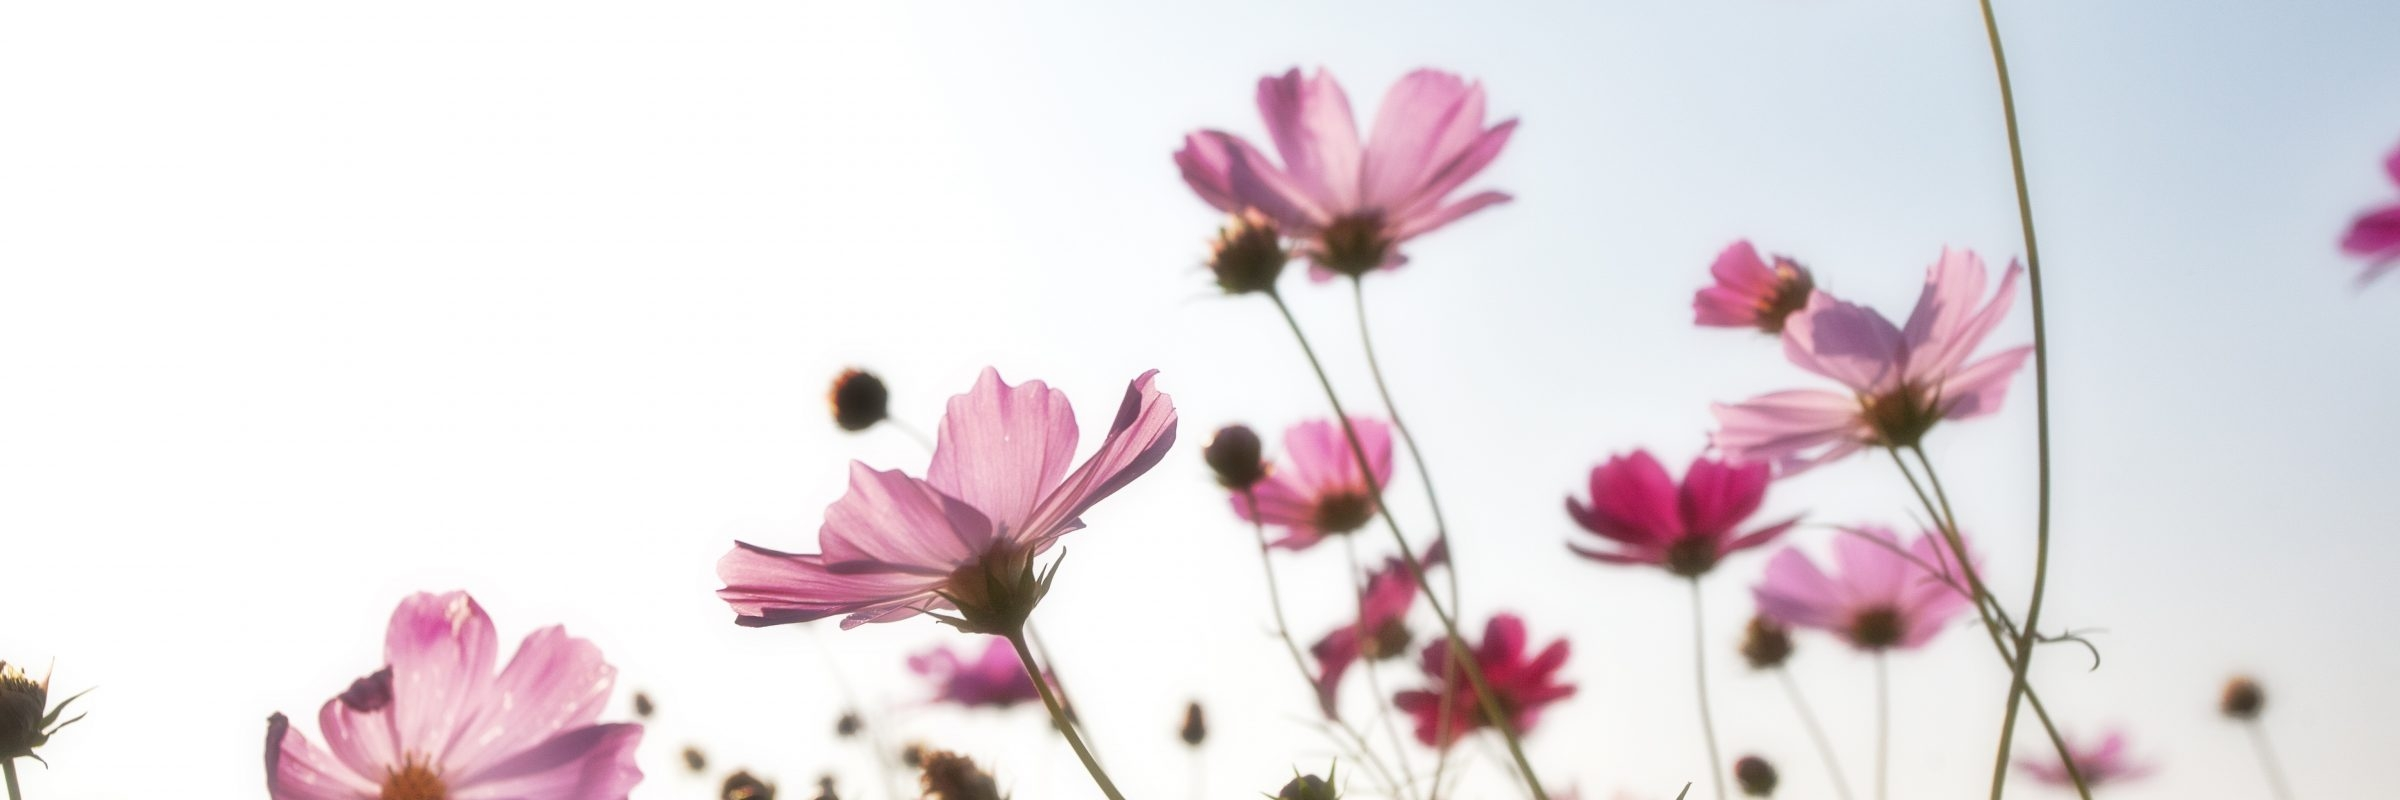 flowers-1476517